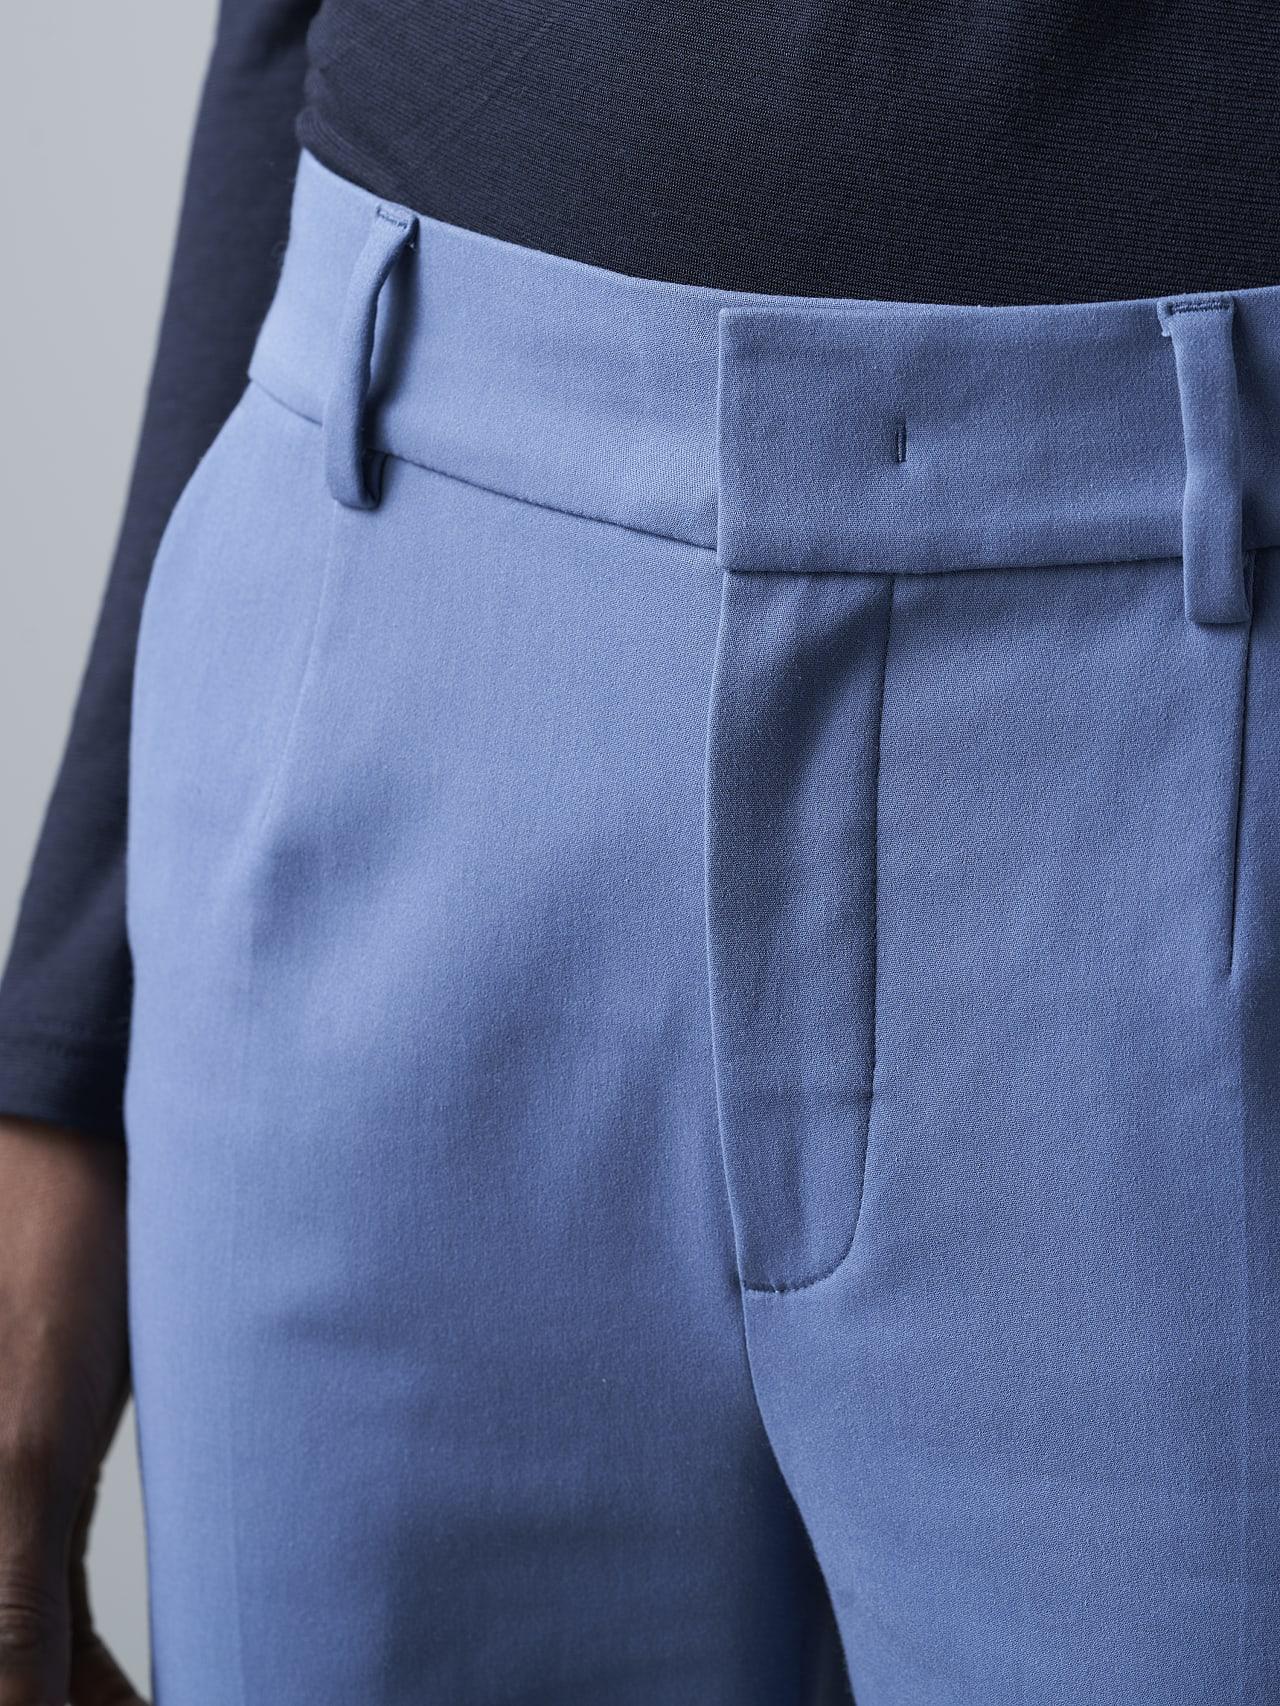 PERTI V1.Y5.02 Slim-Fit Tapered Pants light blue Extra Alpha Tauri